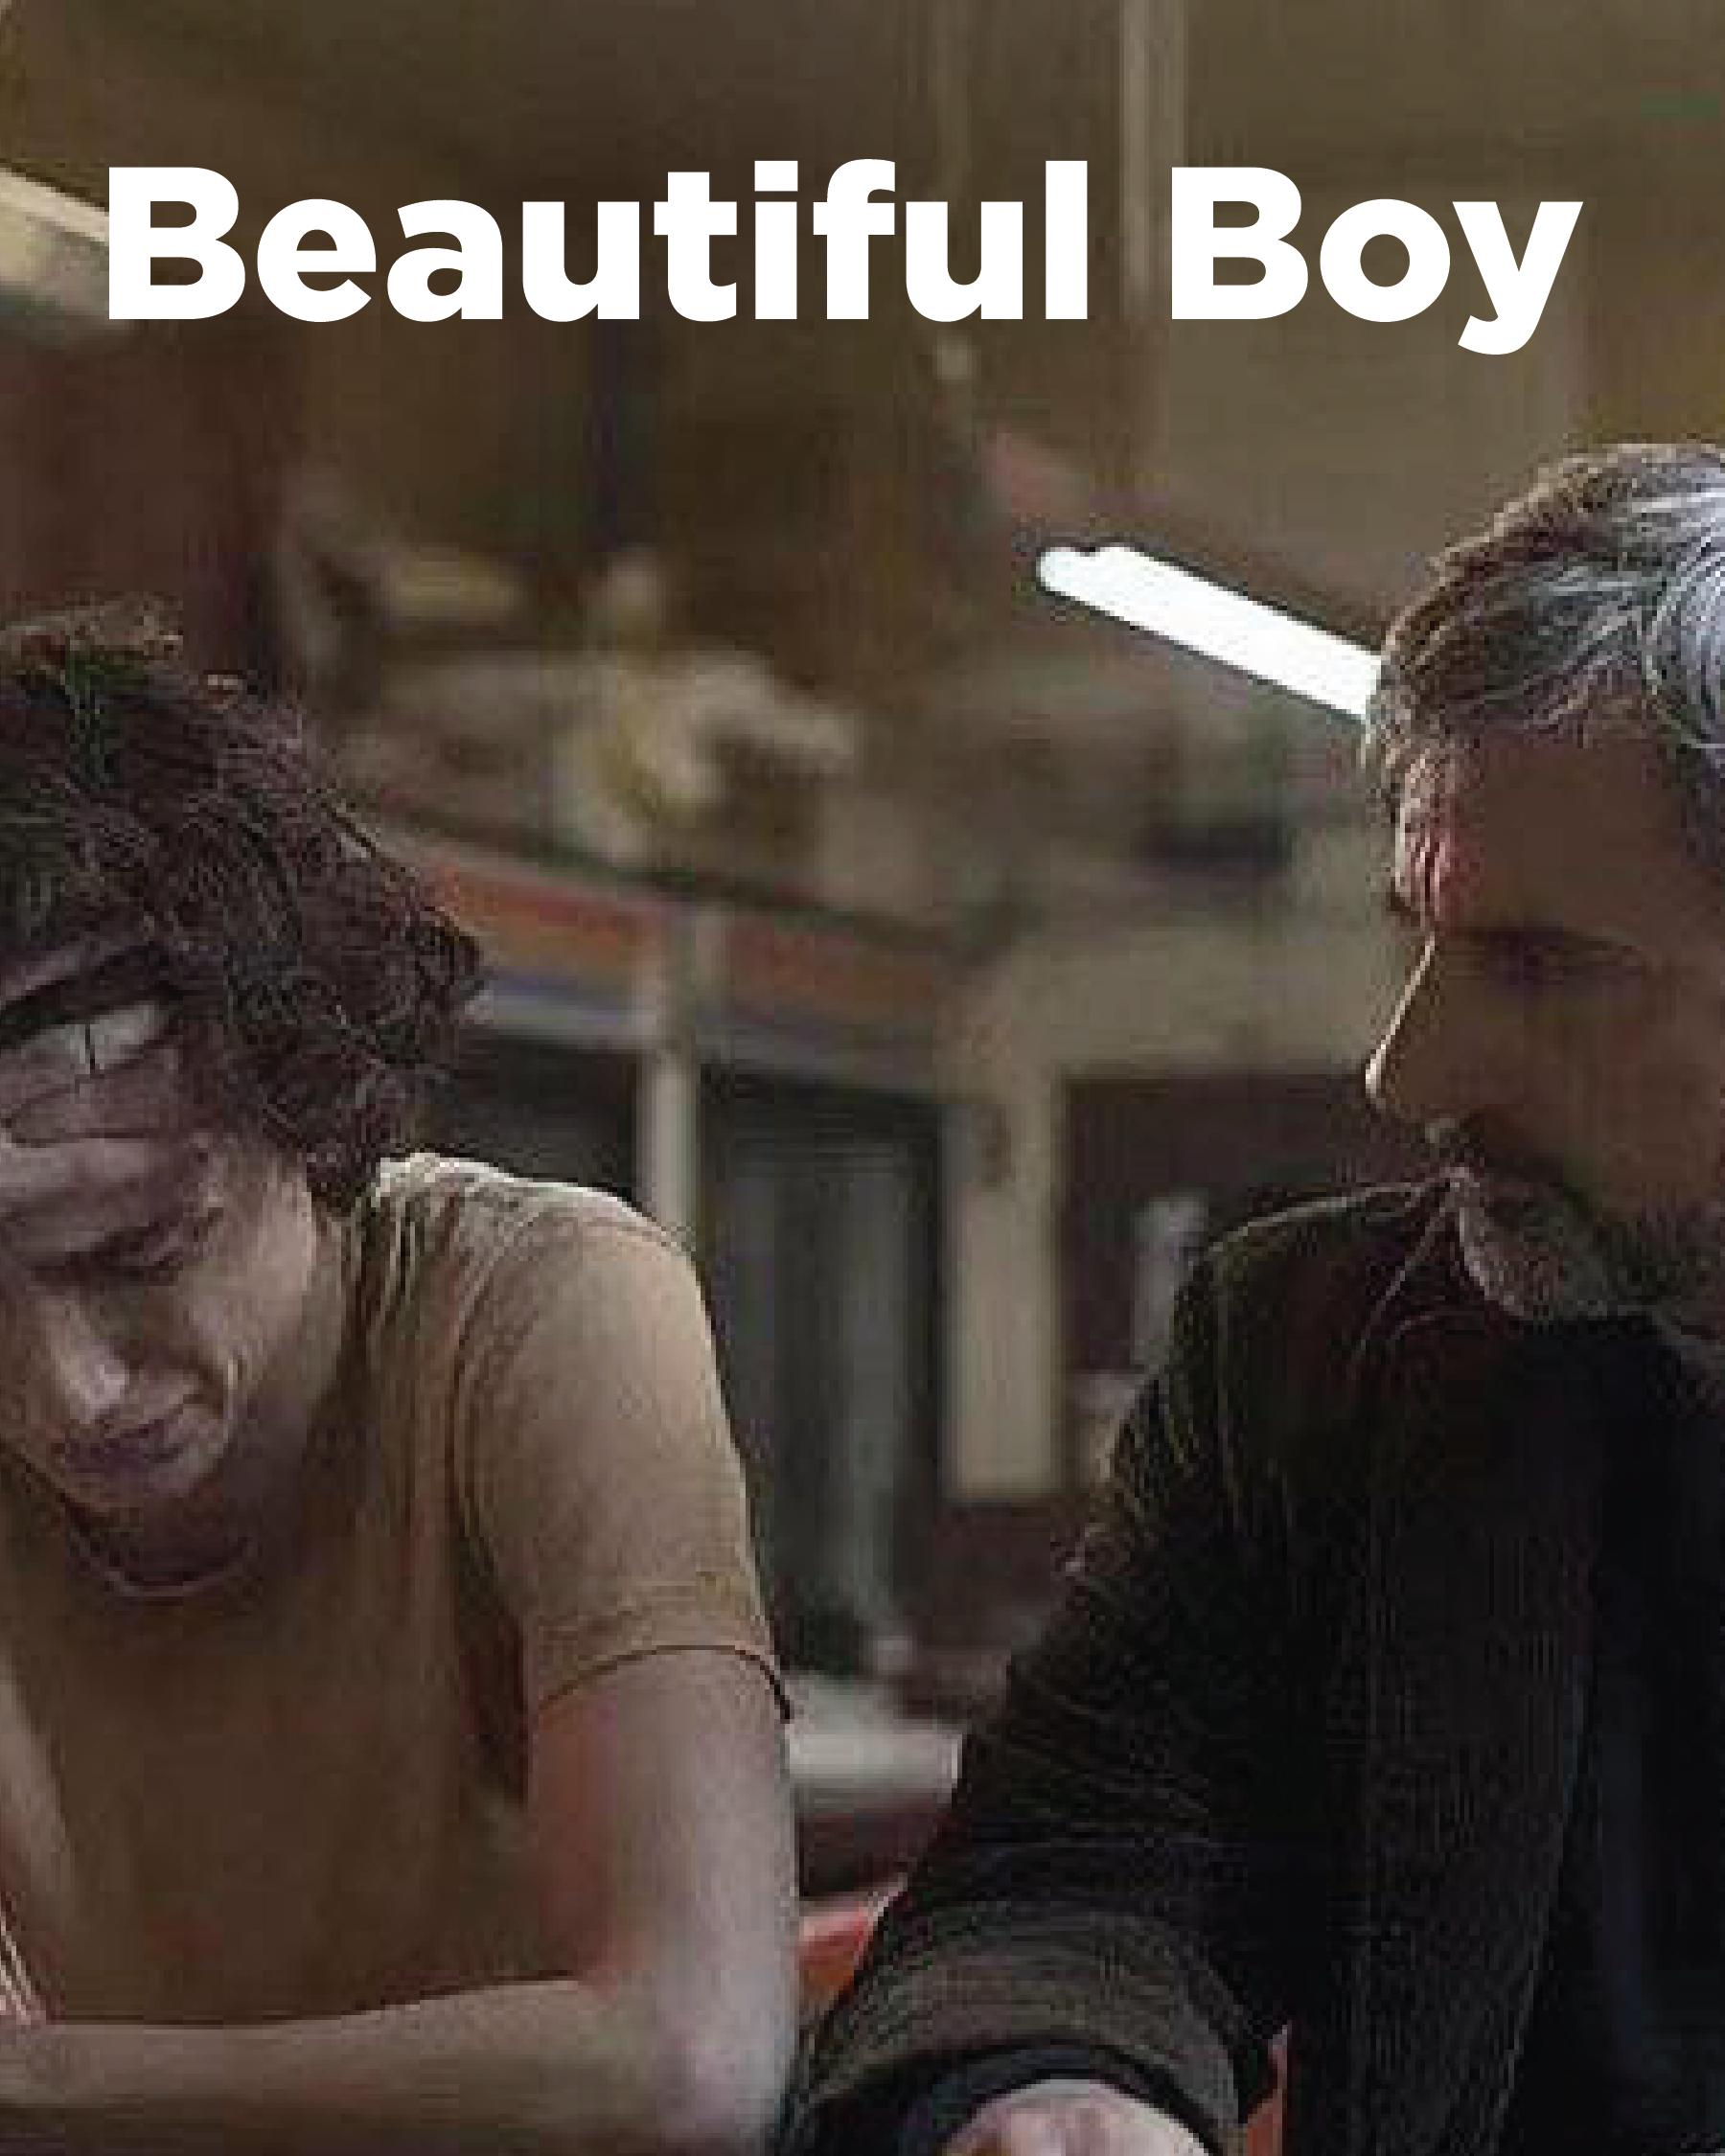 Directed by Felix Van Groeningen, Starring Steve Carell, Timothée Chalamet, Maura Tierney, Amy Ryan